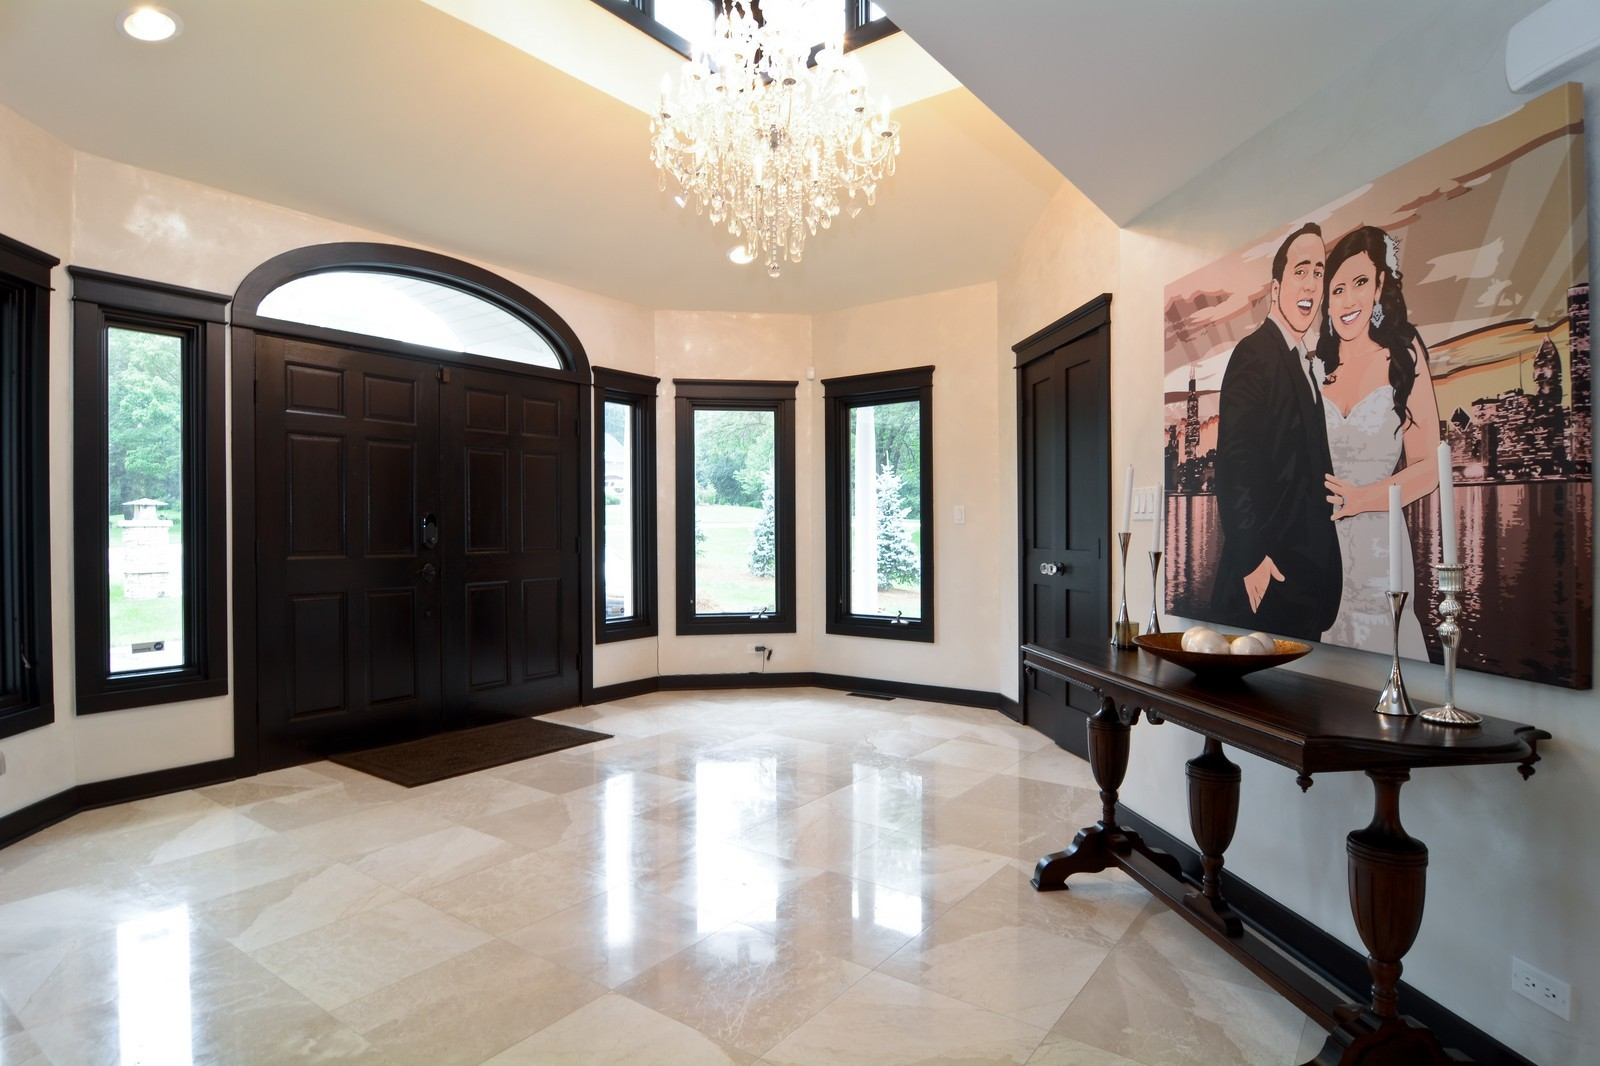 Real Estate Photography - 2S611 Arboritumn, Glen Ellyn, IL, 60137 - Foyer